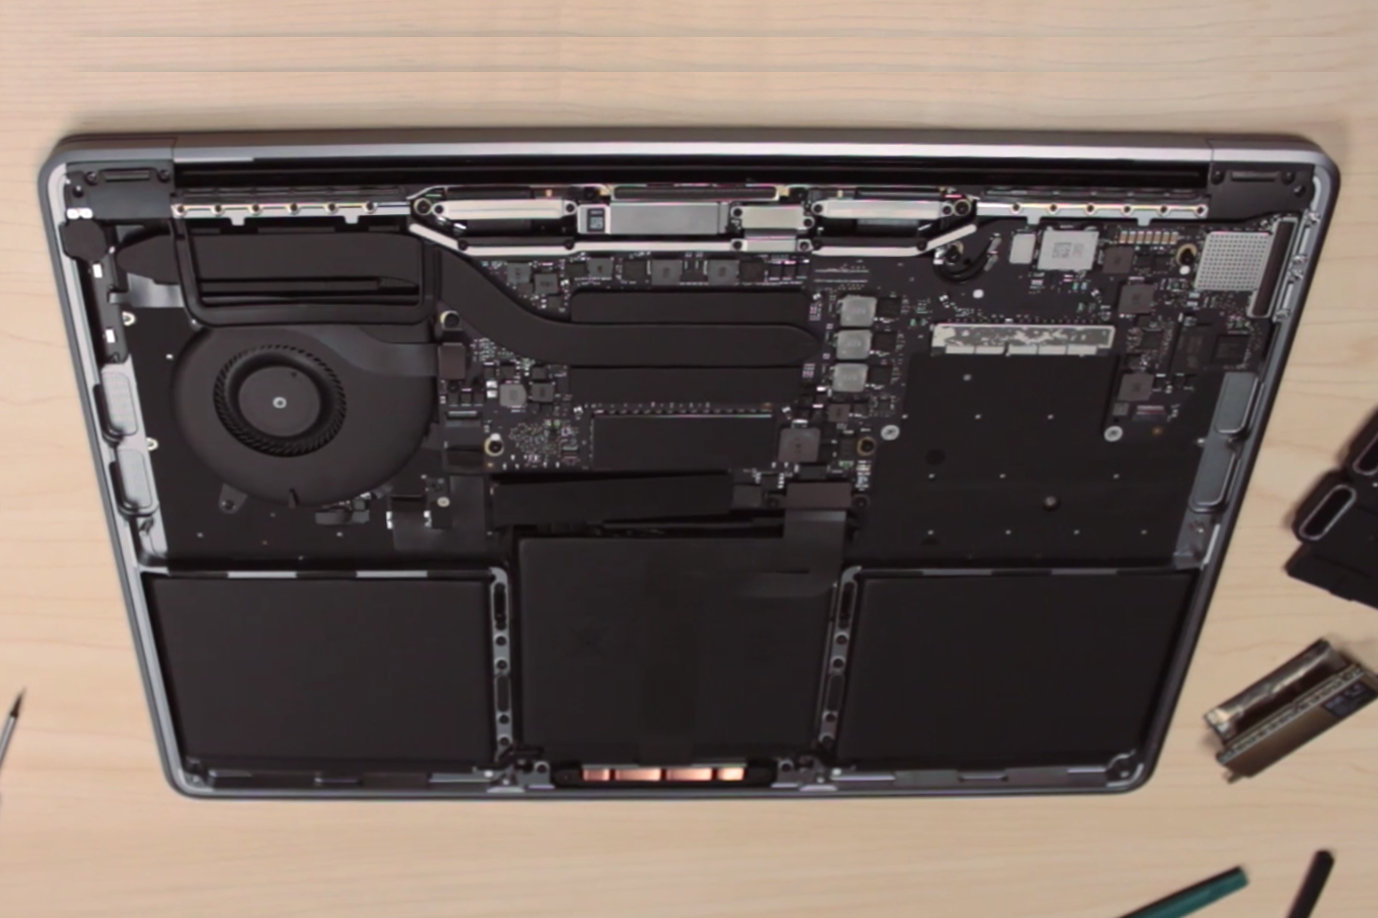 Innenaufbau MacBook Pro 13 Zoll ohne Touch Bar